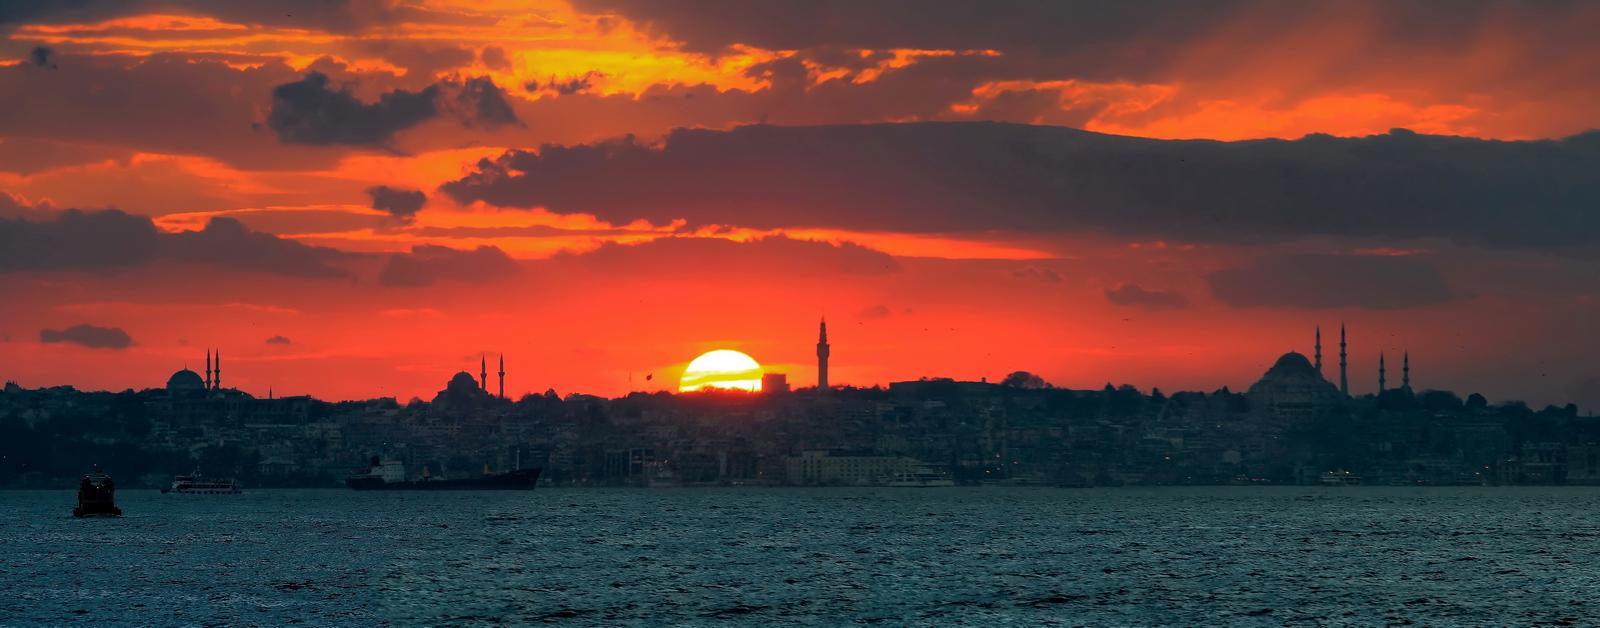 Вечерний_Стамбул_панорама_города_Турция